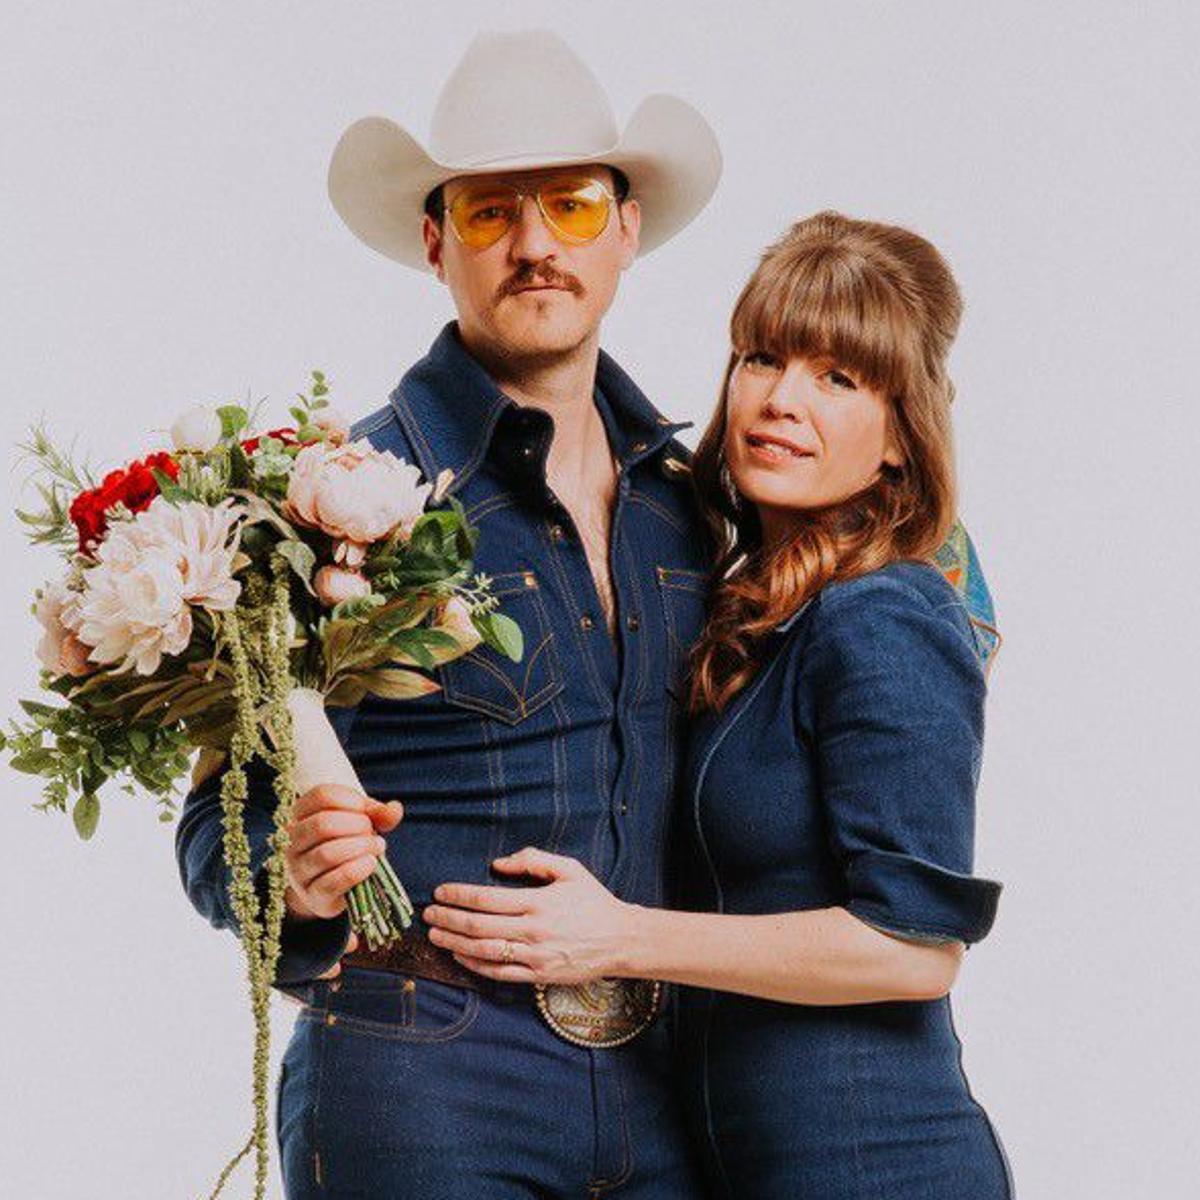 Twang rocker Blake Berglund returns to Pub with wife Belle